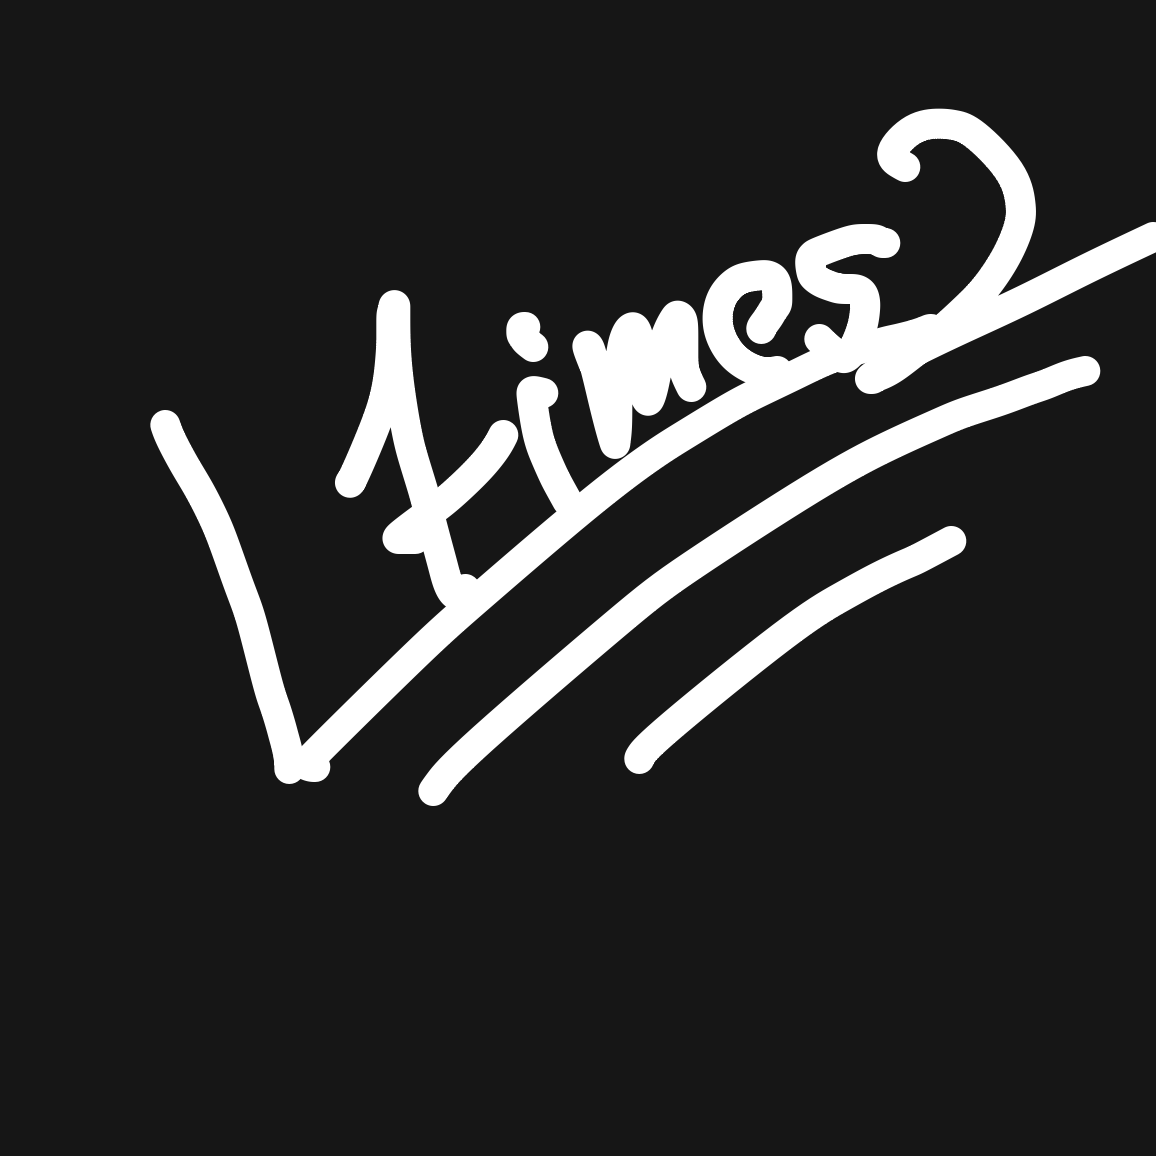 Profile picture for the comic artist, L_times2